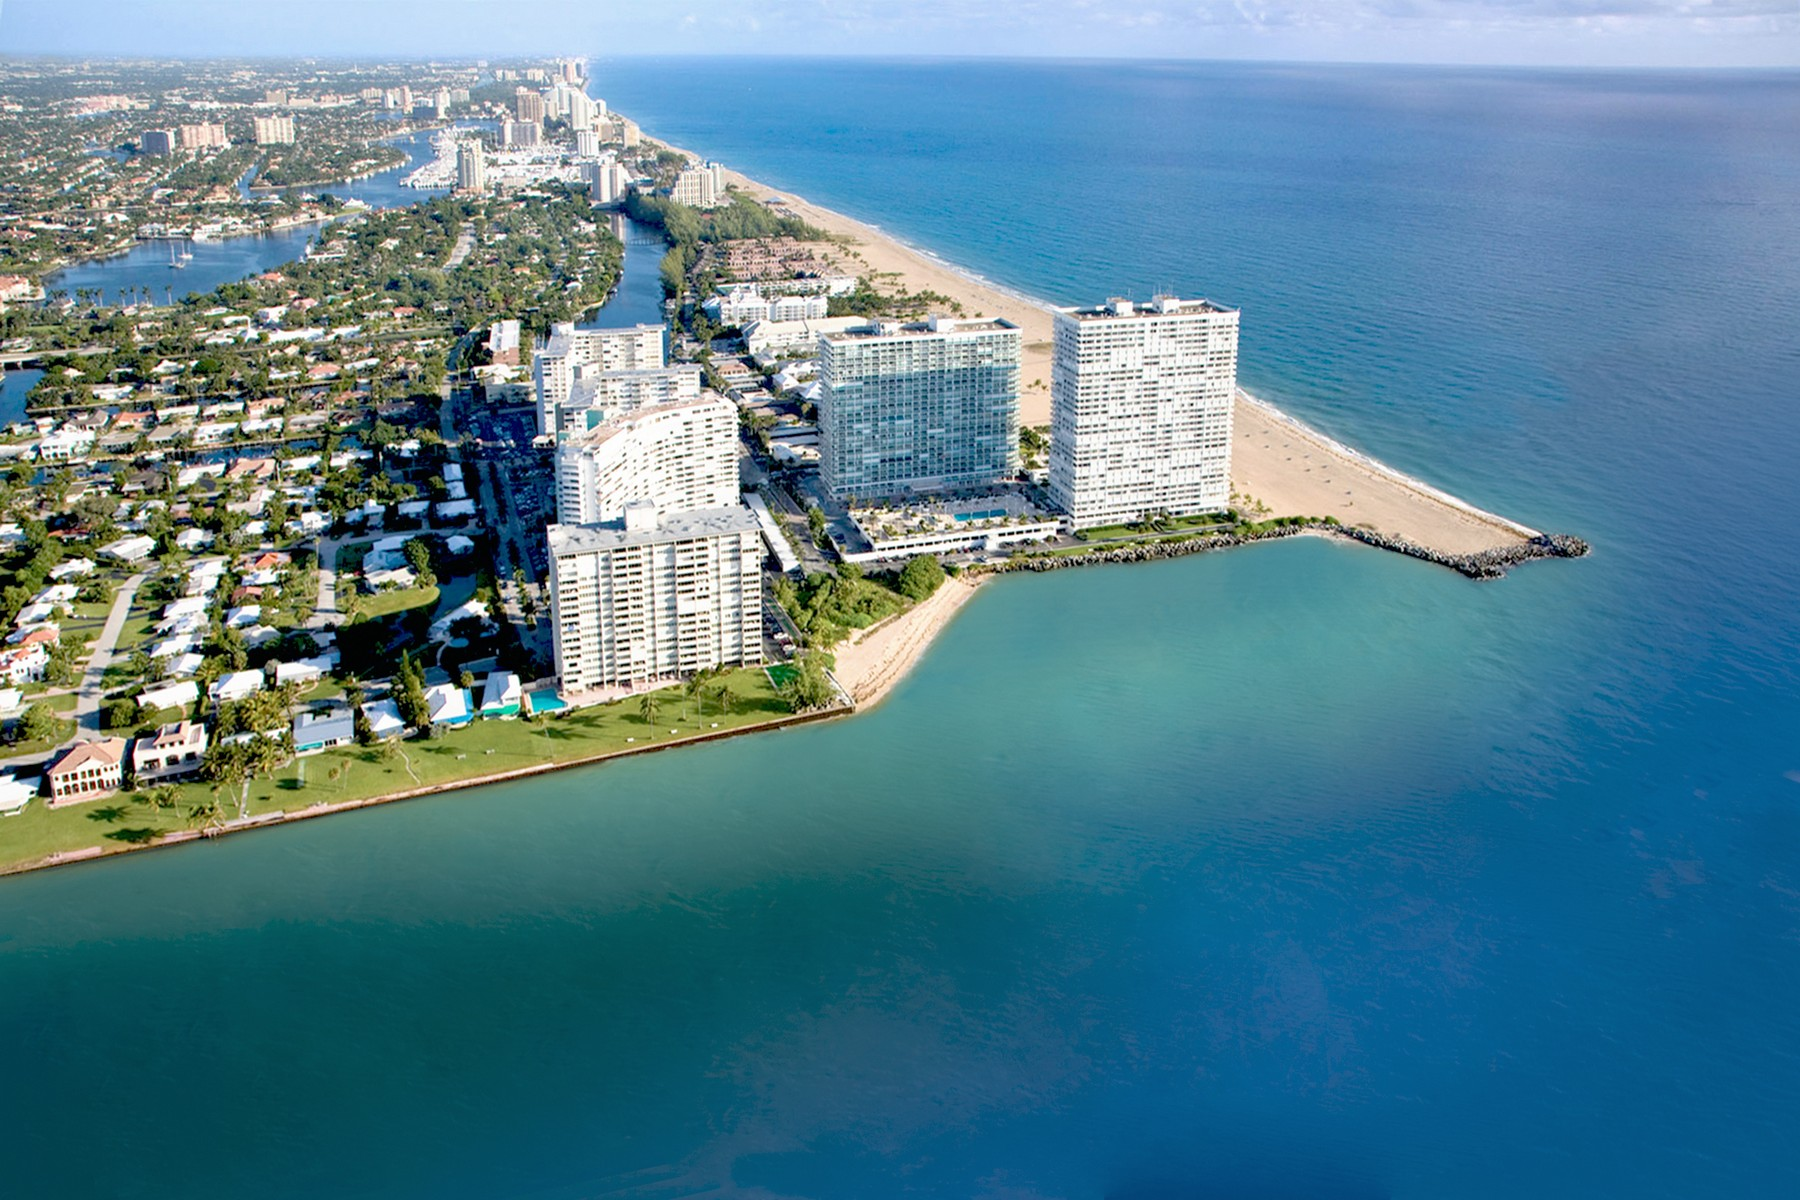 Moradia para Venda às 2200 S. Ocean Lane Unit# 2809-0 Fort Lauderdale, Florida 33316 Estados Unidos